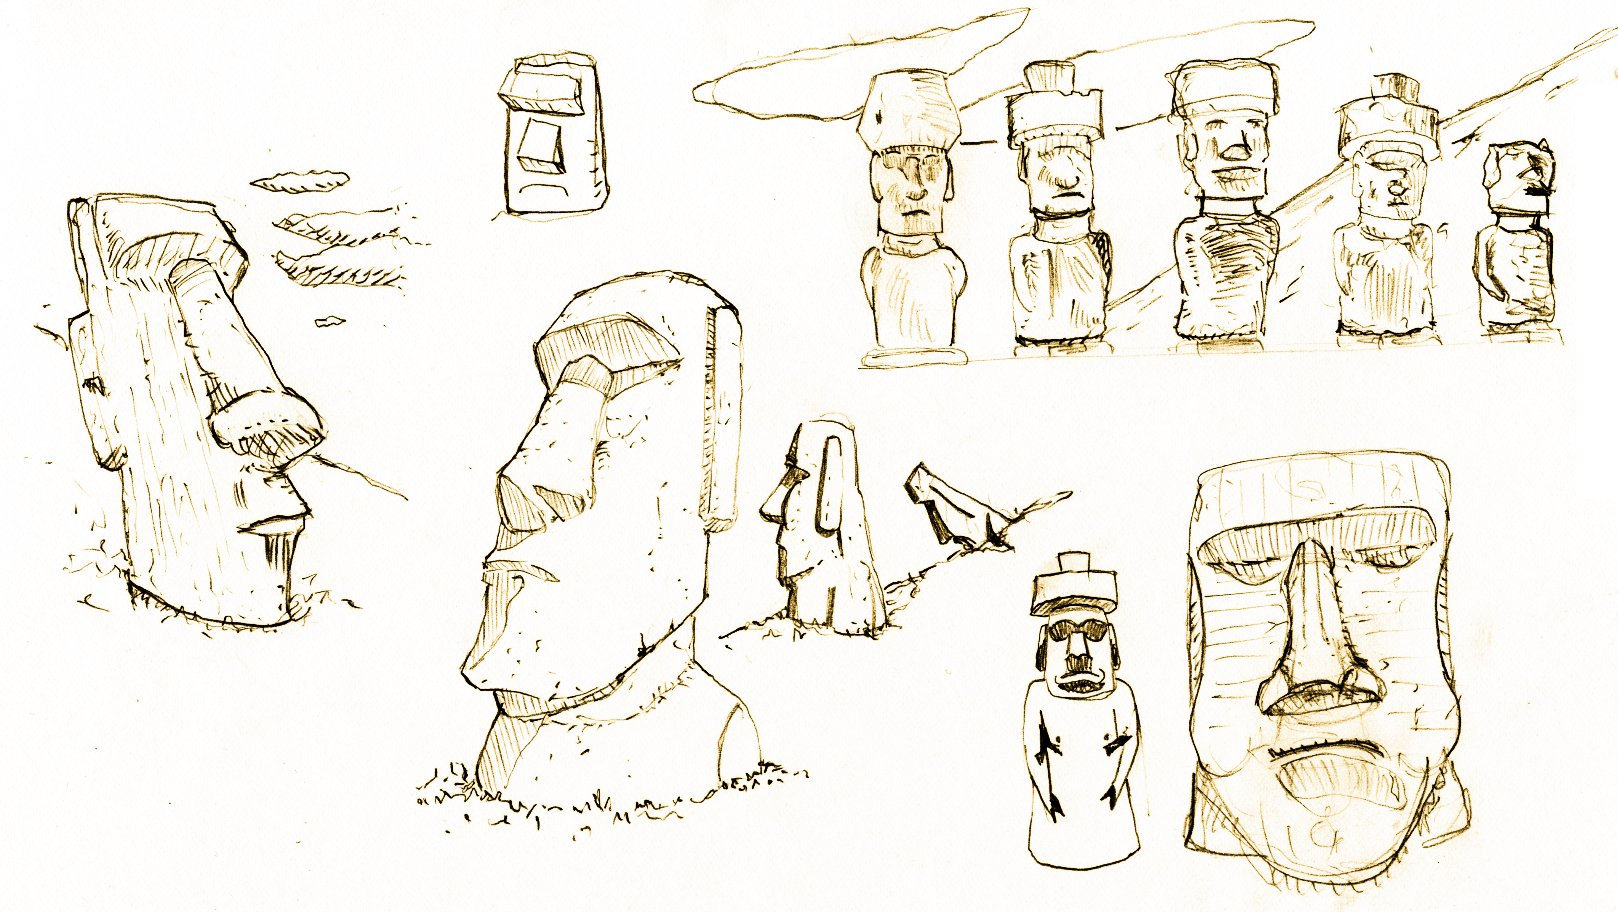 Thumbnail Sketches of Maoi by VxD    CC BY-SA 2.5 , via Wikimedia Commons